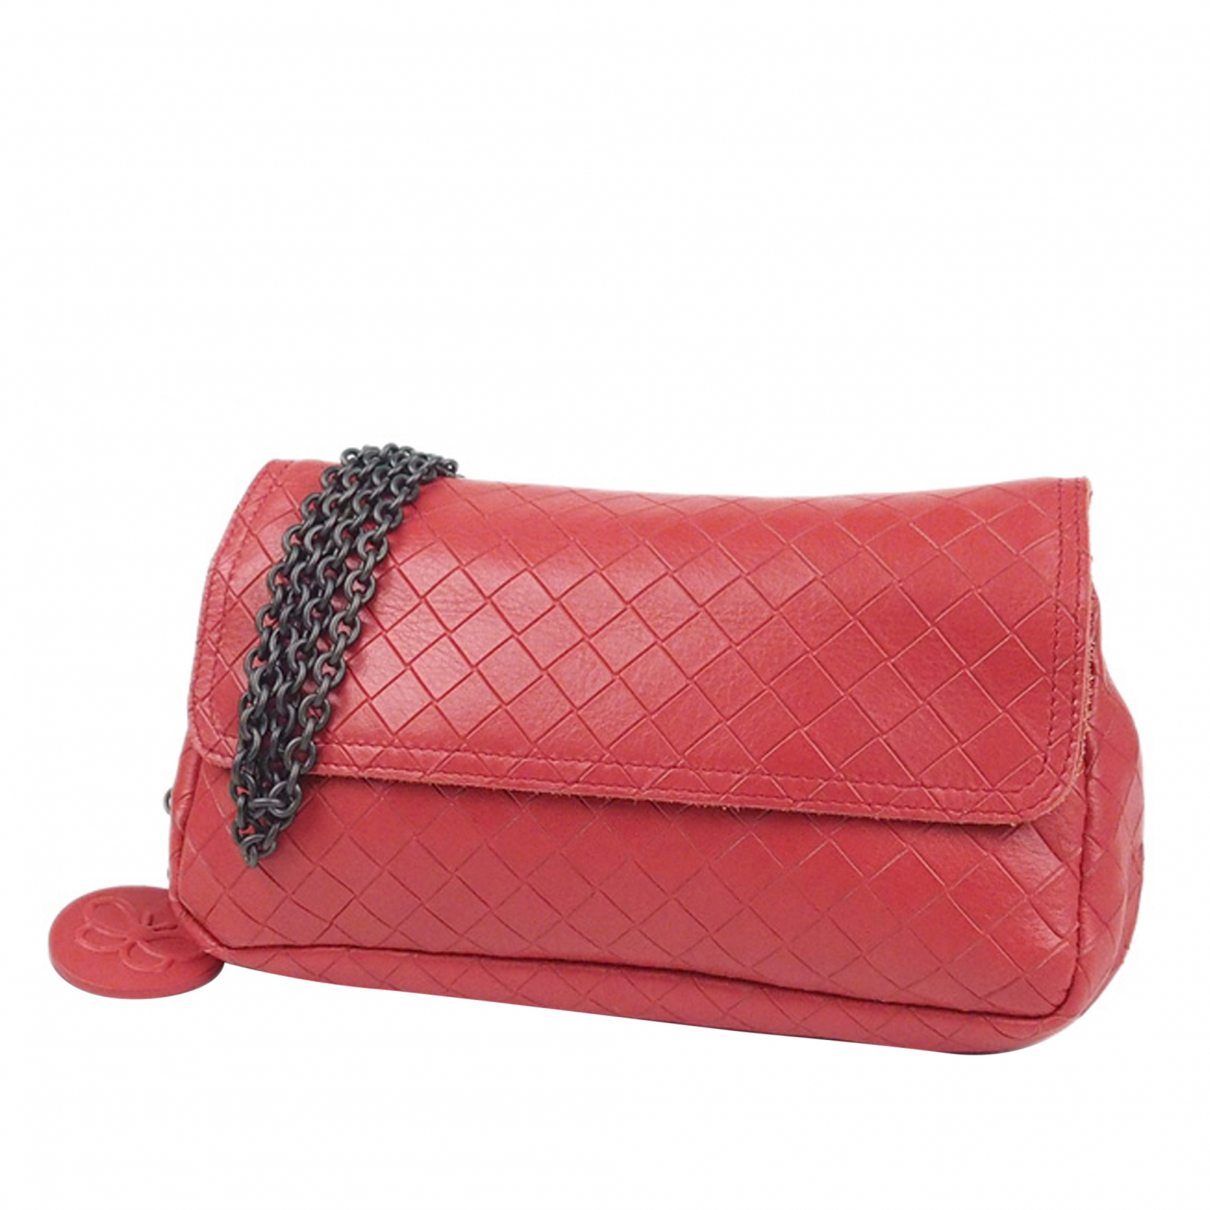 Bottega Veneta - Sac a main   pour femme en cuir - rouge